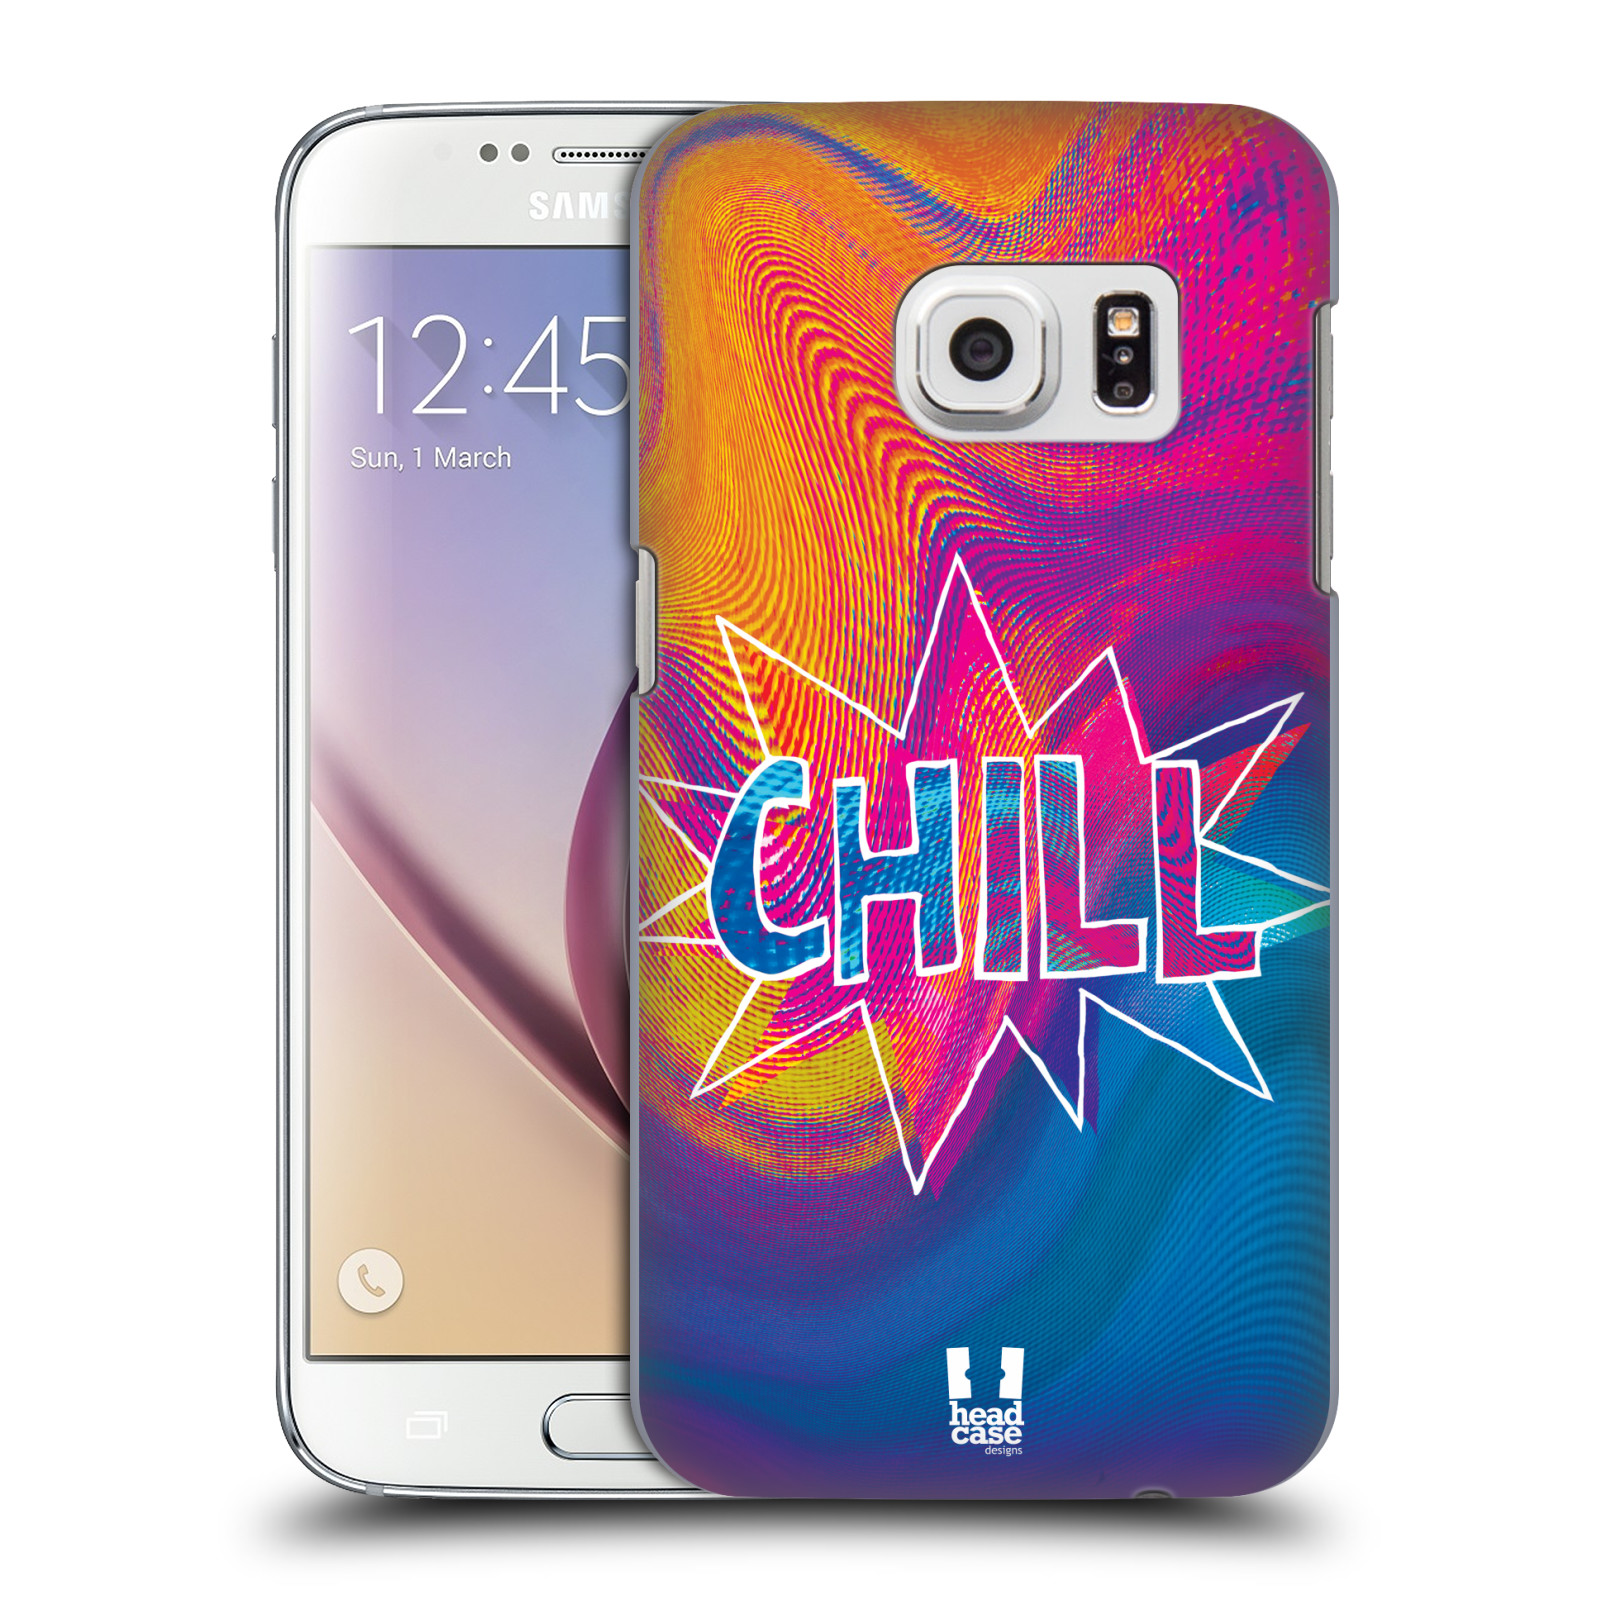 Plastové pouzdro na mobil Samsung Galaxy S7 HEAD CASE HOLOGRAF CHILL (Kryt či obal na mobilní telefon Samsung Galaxy S7 SM-G930F)